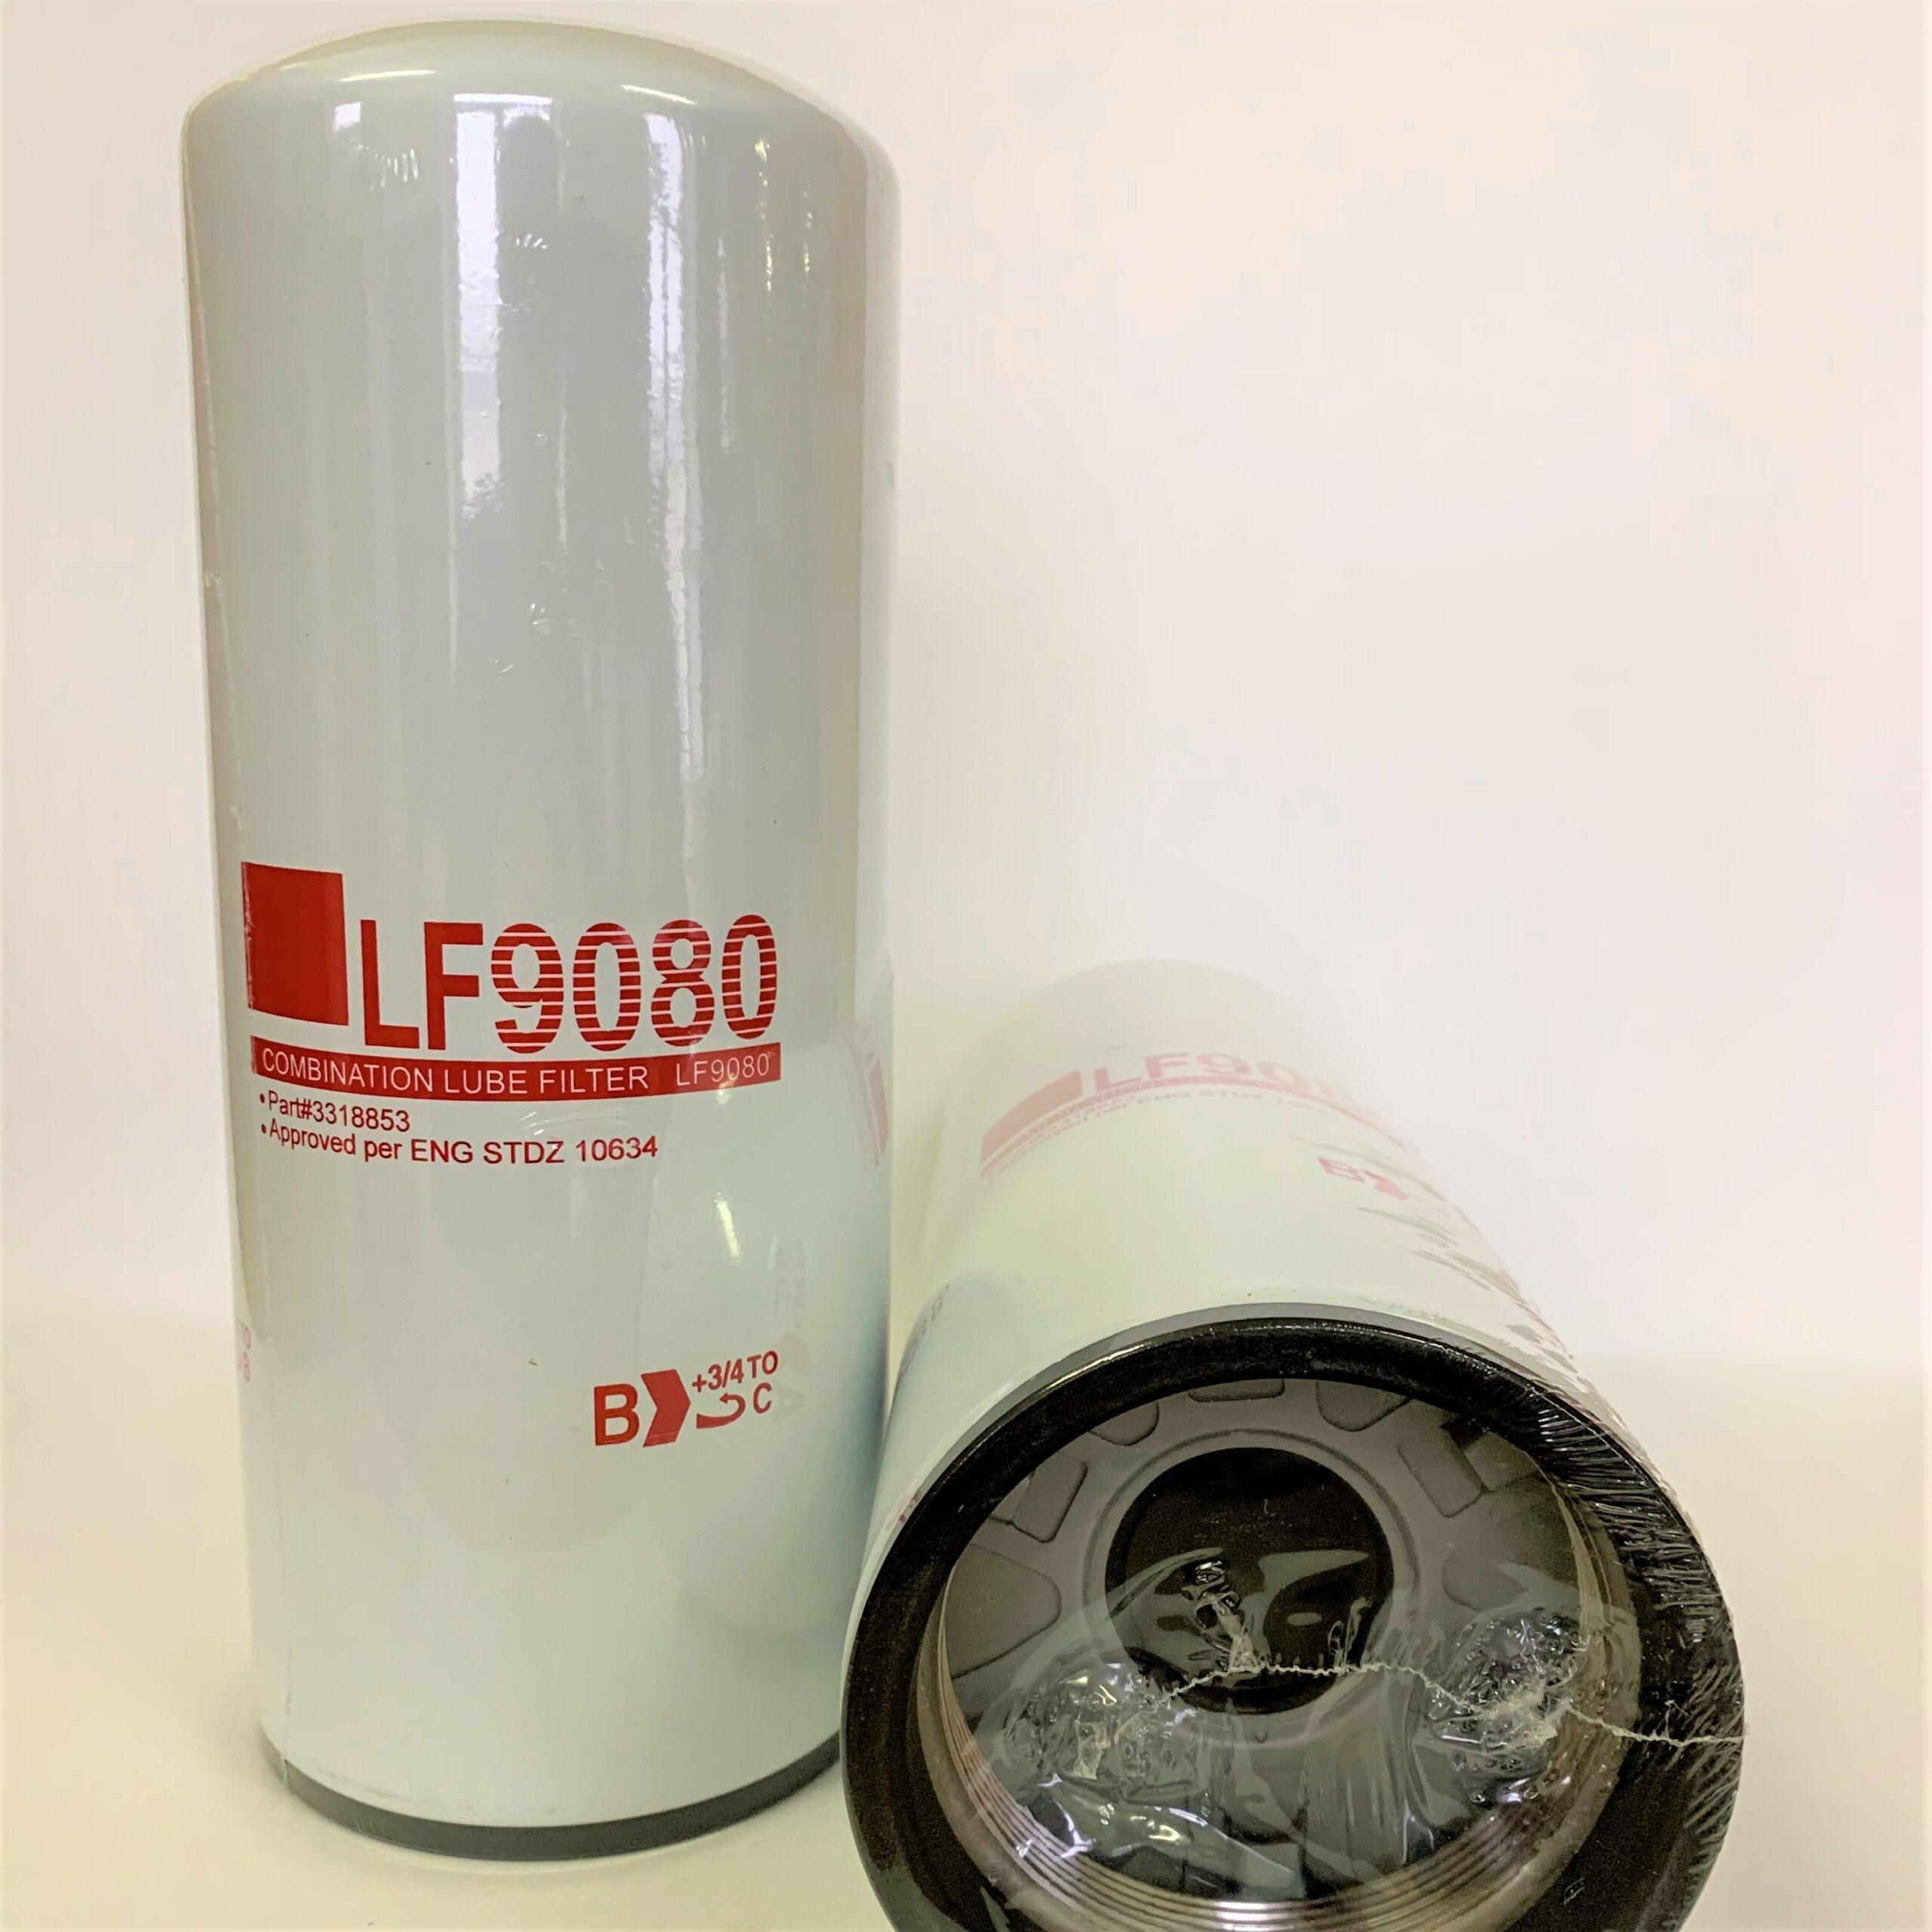 LF9080